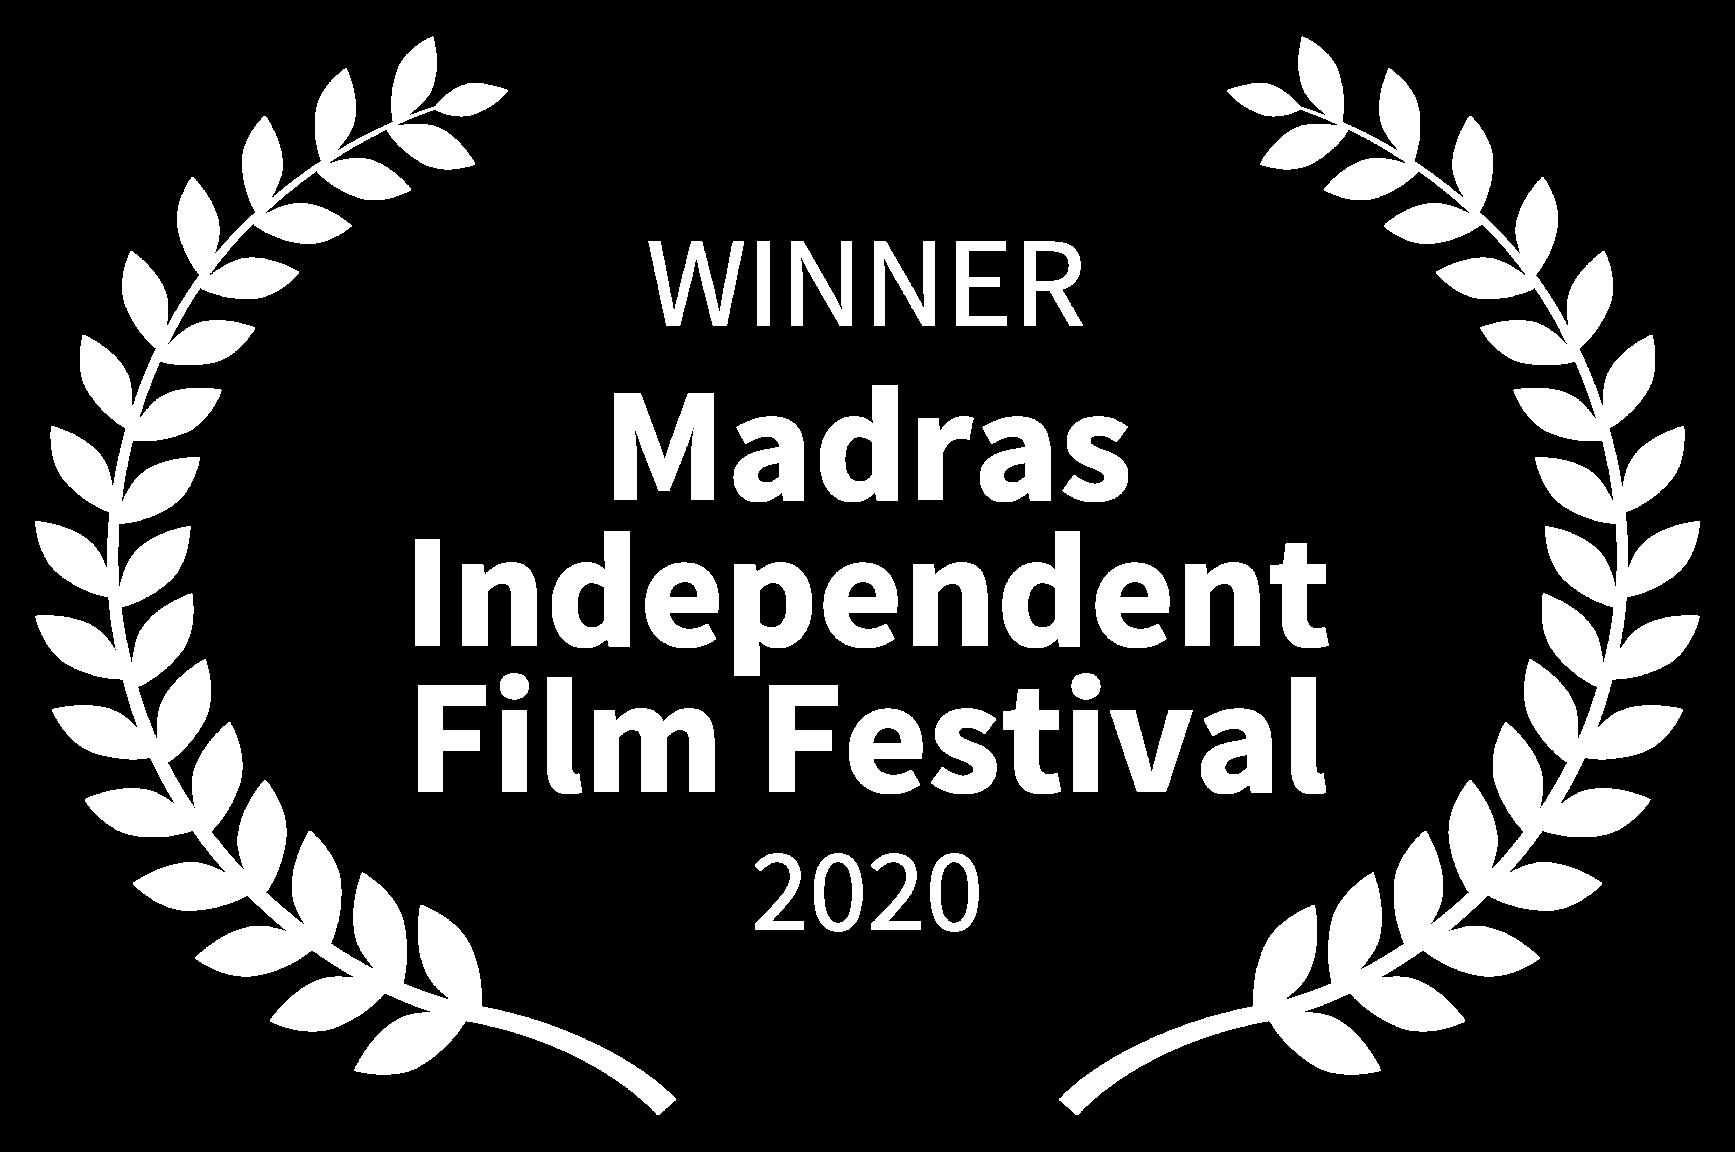 WINNER - Madras Independent Film Festival - 2020